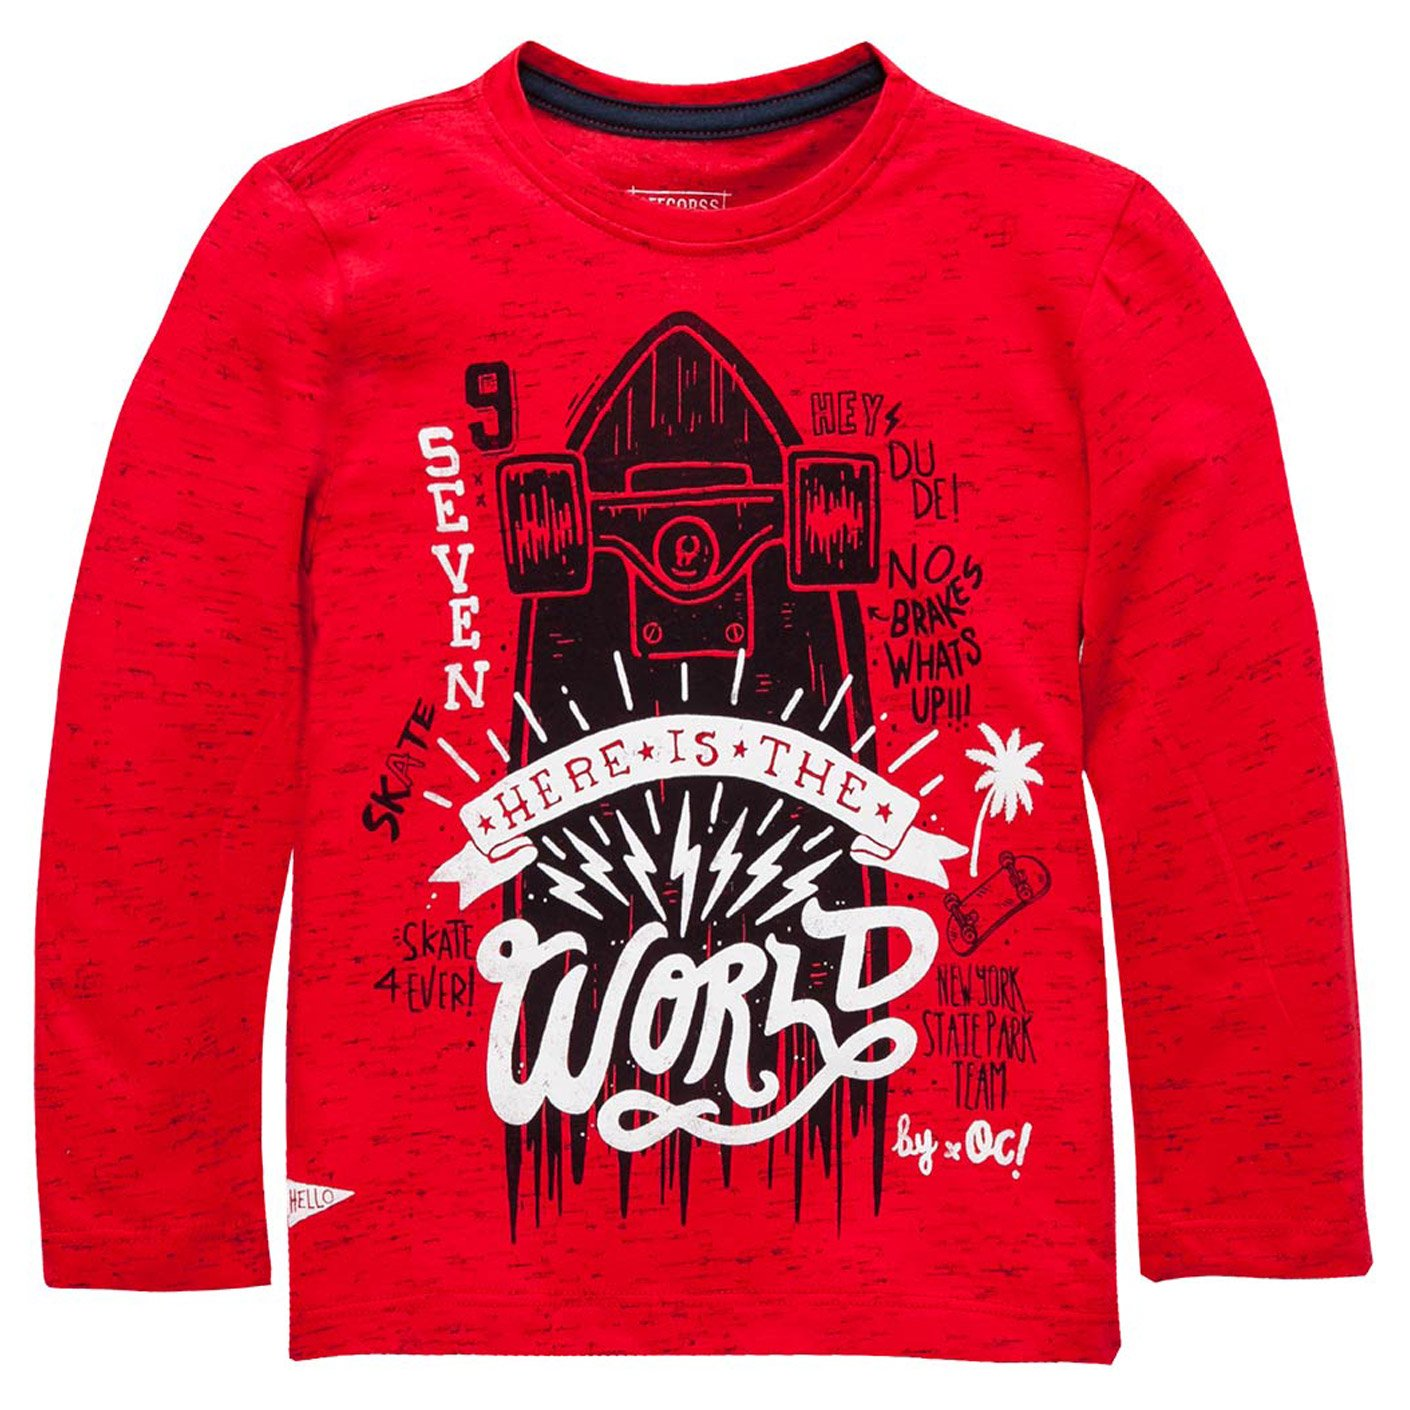 Amazon.com: OFFCORSS Boys Long Sleeve Tshirt Camiseta Para Niños Manga Larga Red 12 Months: Clothing